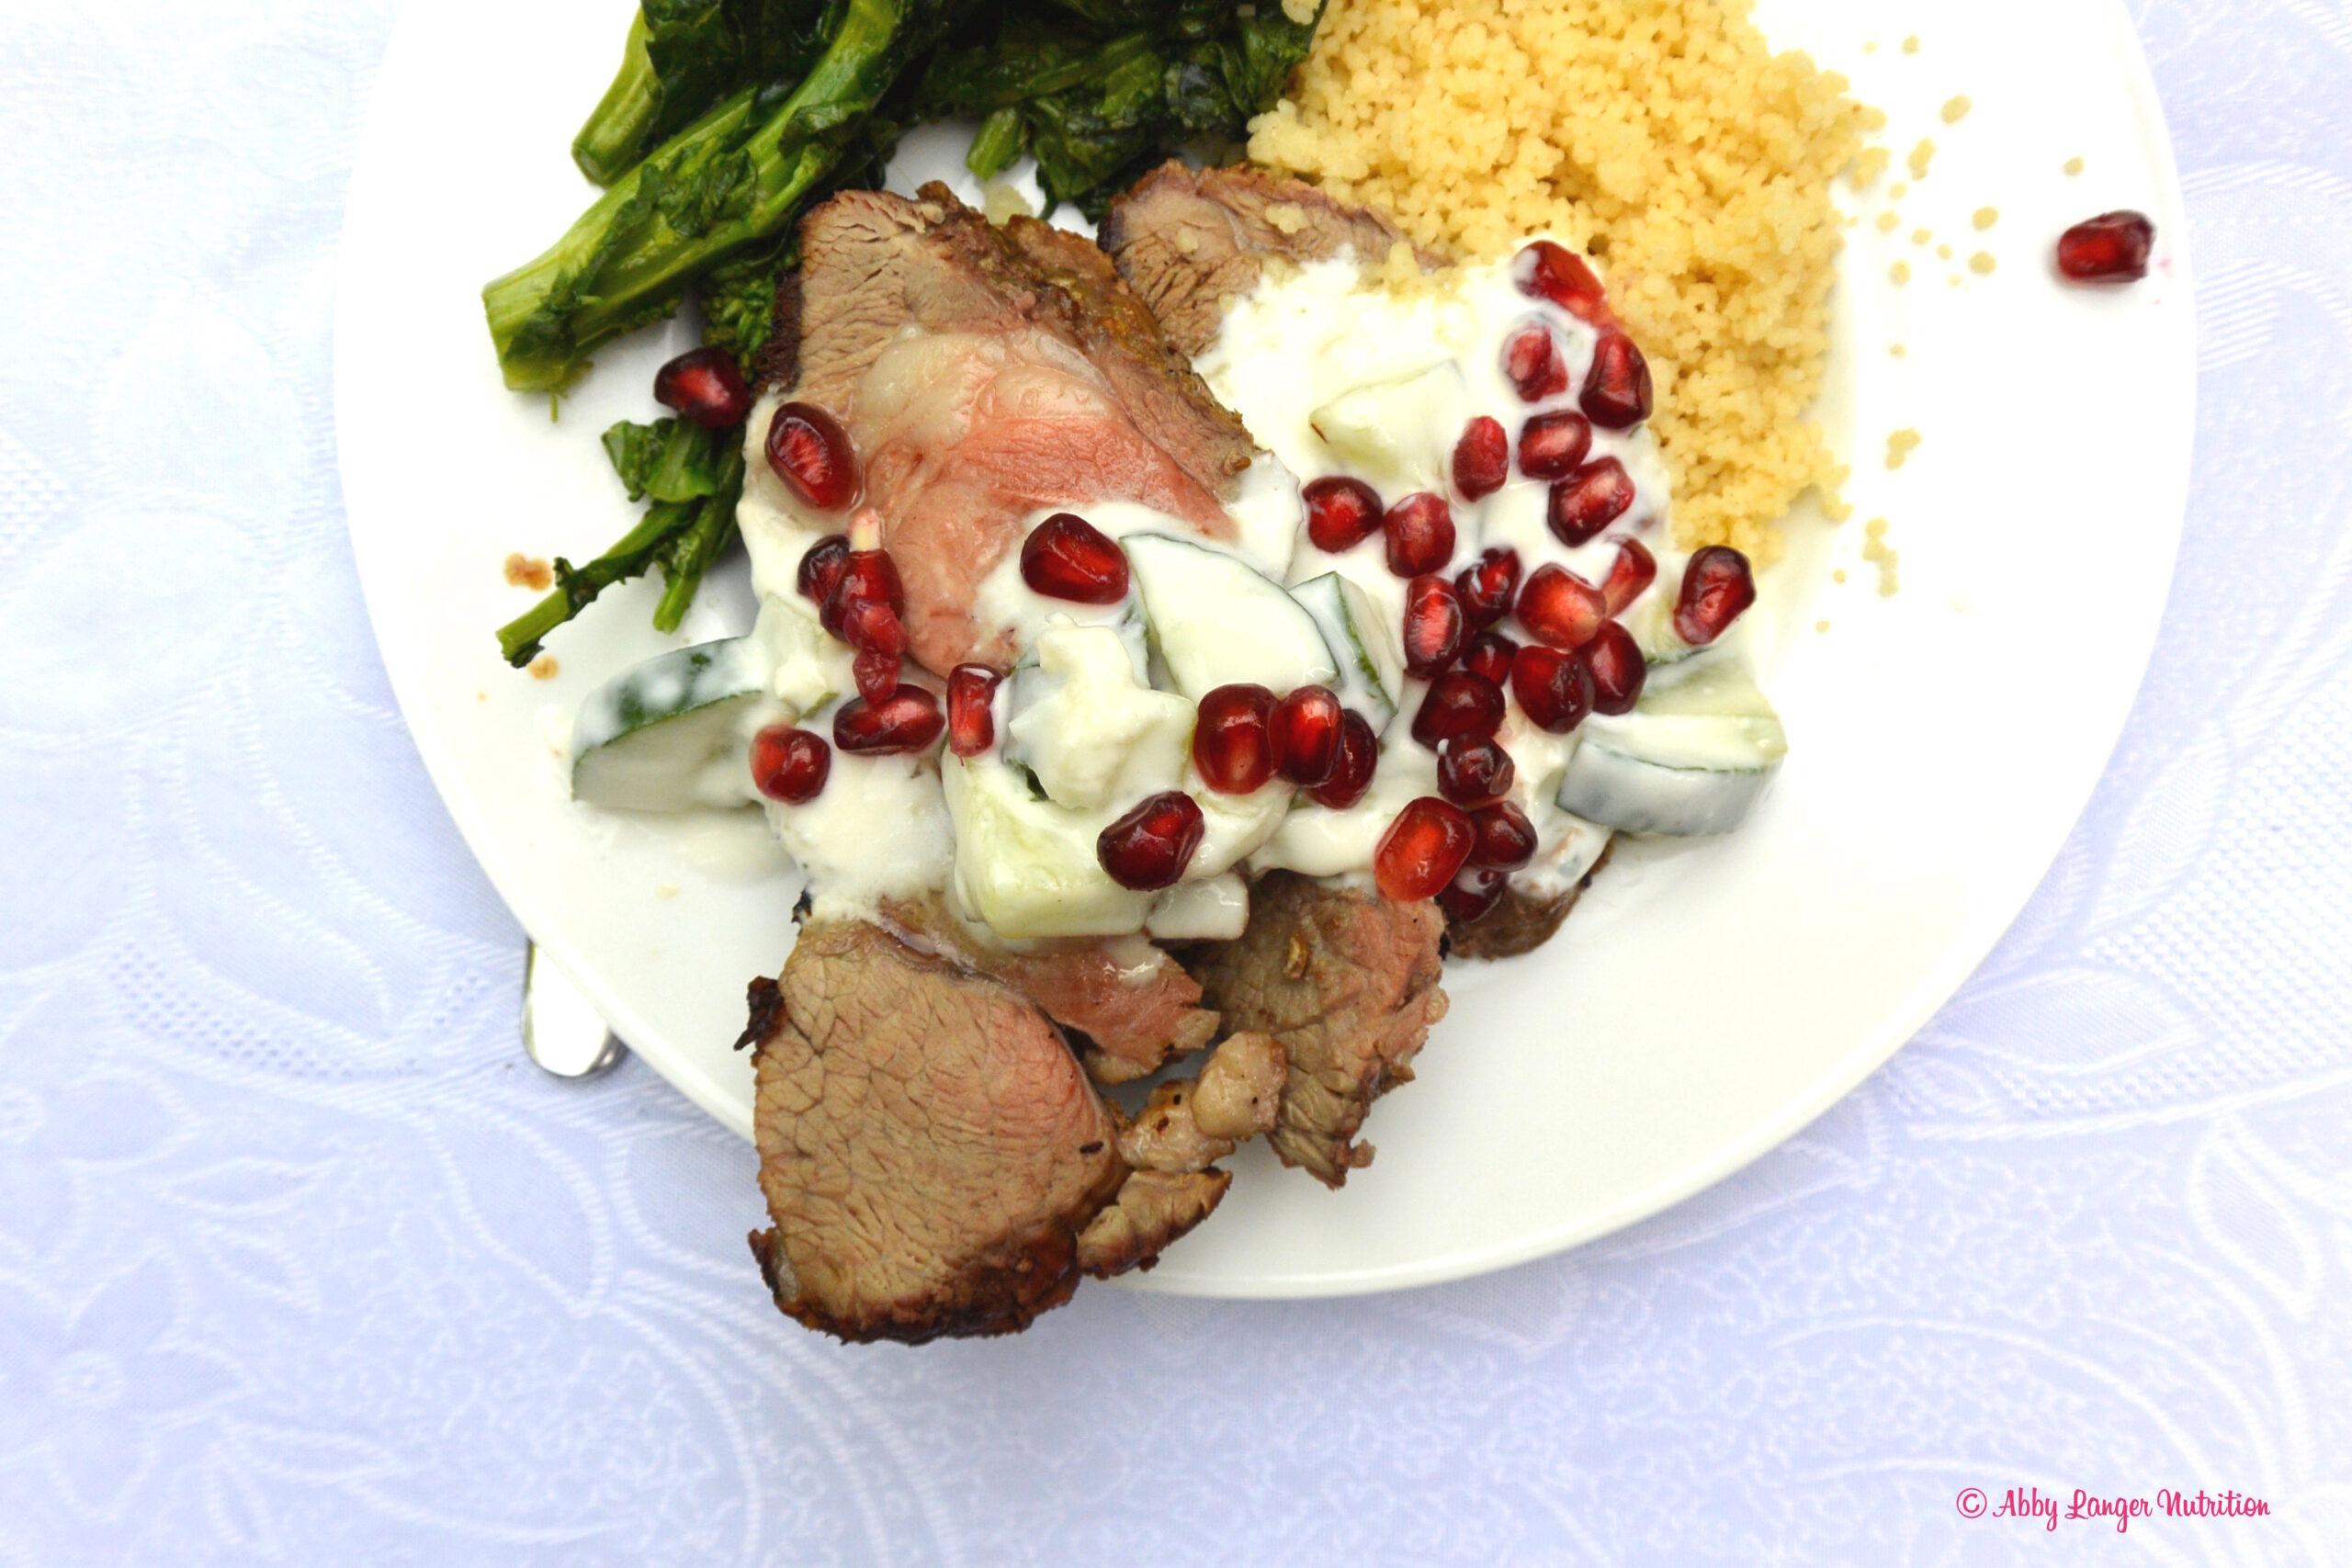 ... Sponsored Post) Recipe - BBQ Lamb with Yogurt Mint Sauce - Abby Langer